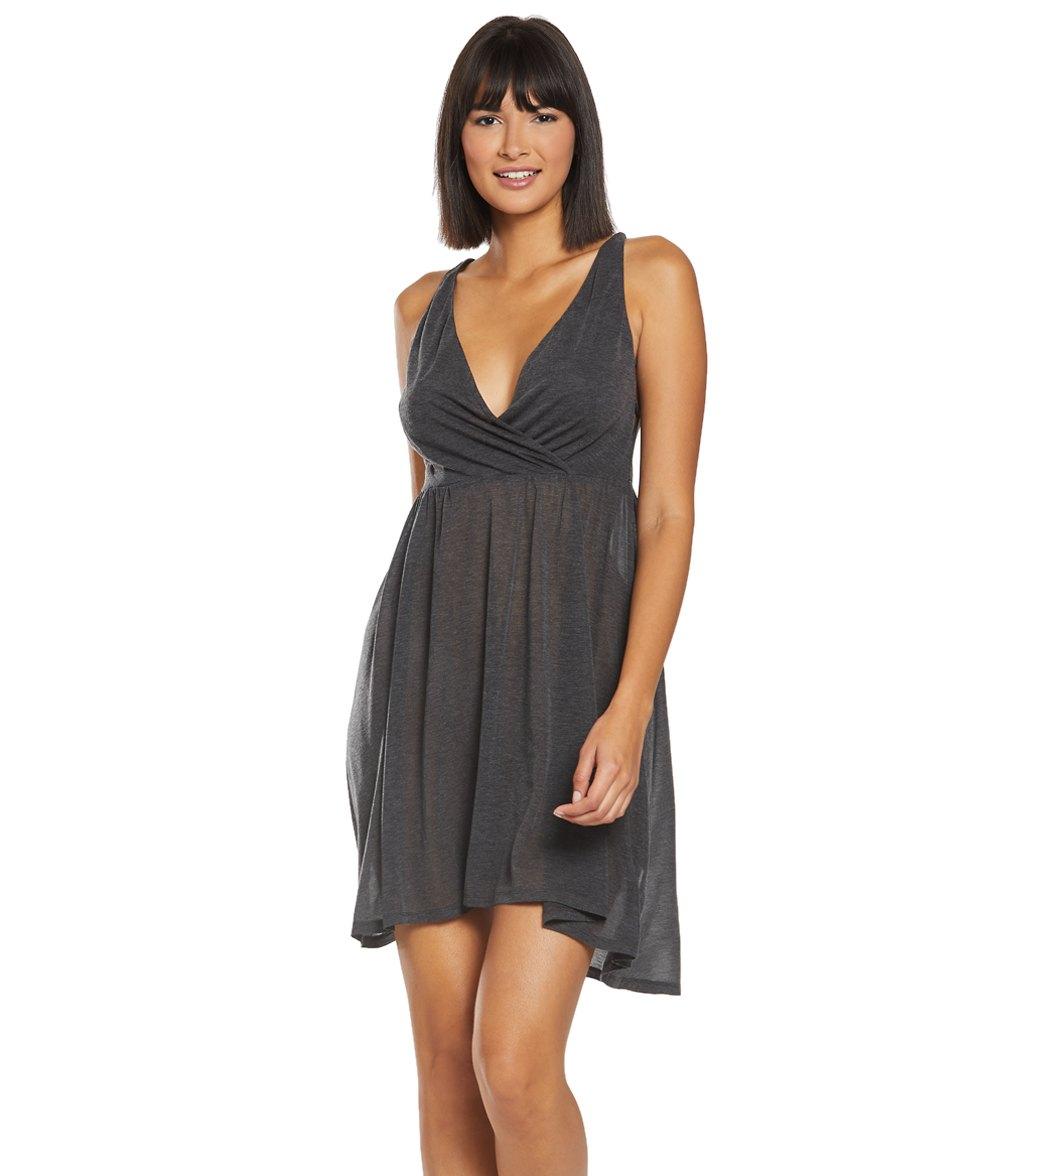 571fcf987a939 prAna Delori Cover Up Dress